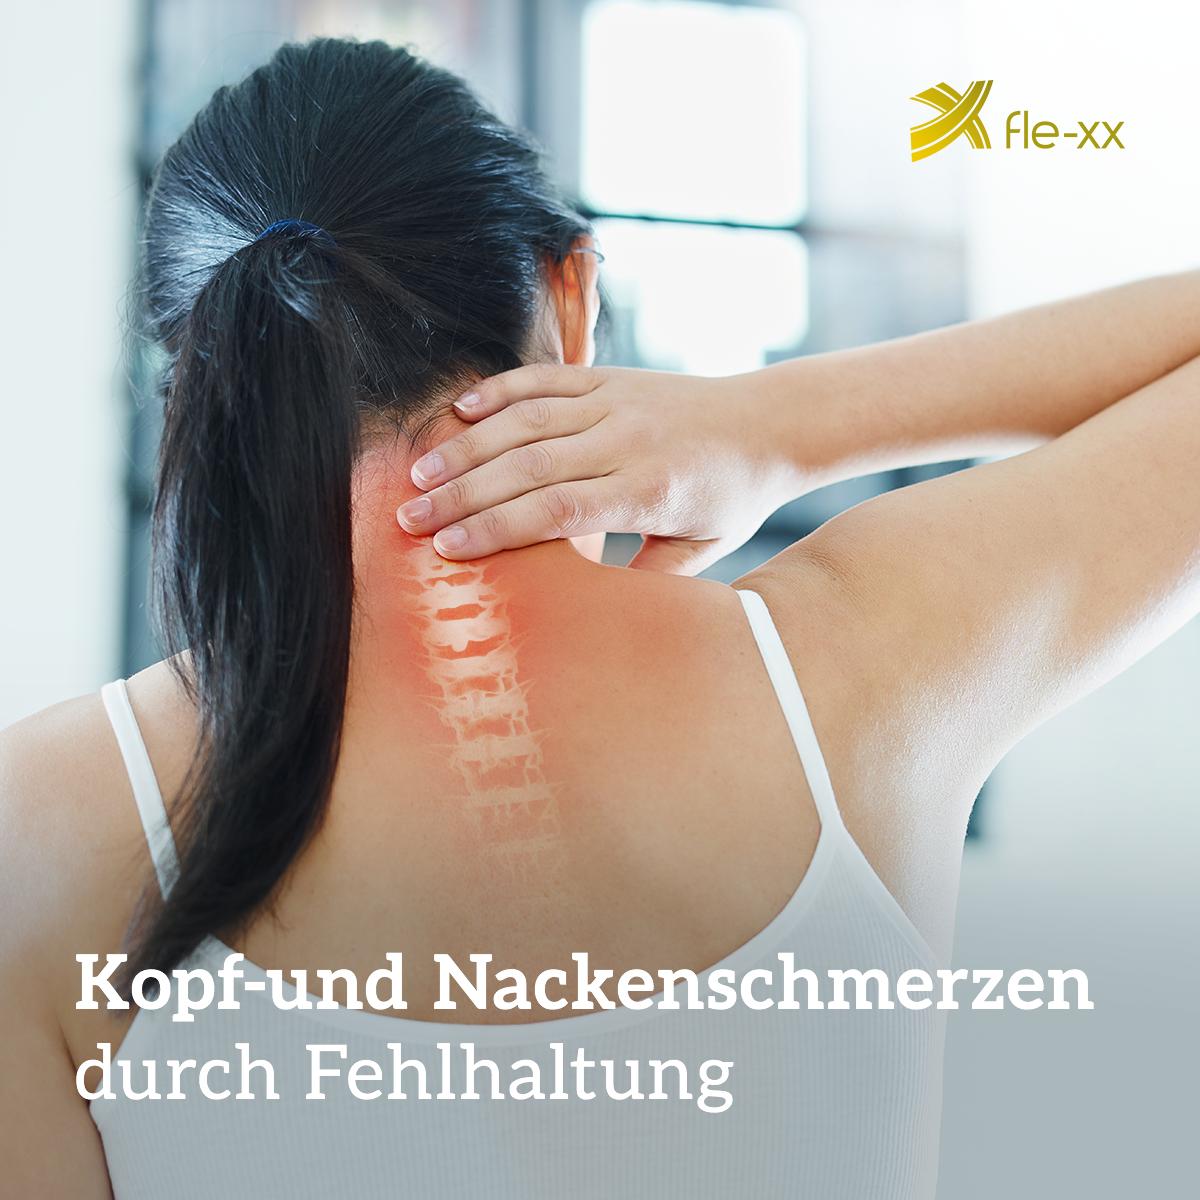 Facebook_fle-xx_gegen_Schmerzen2